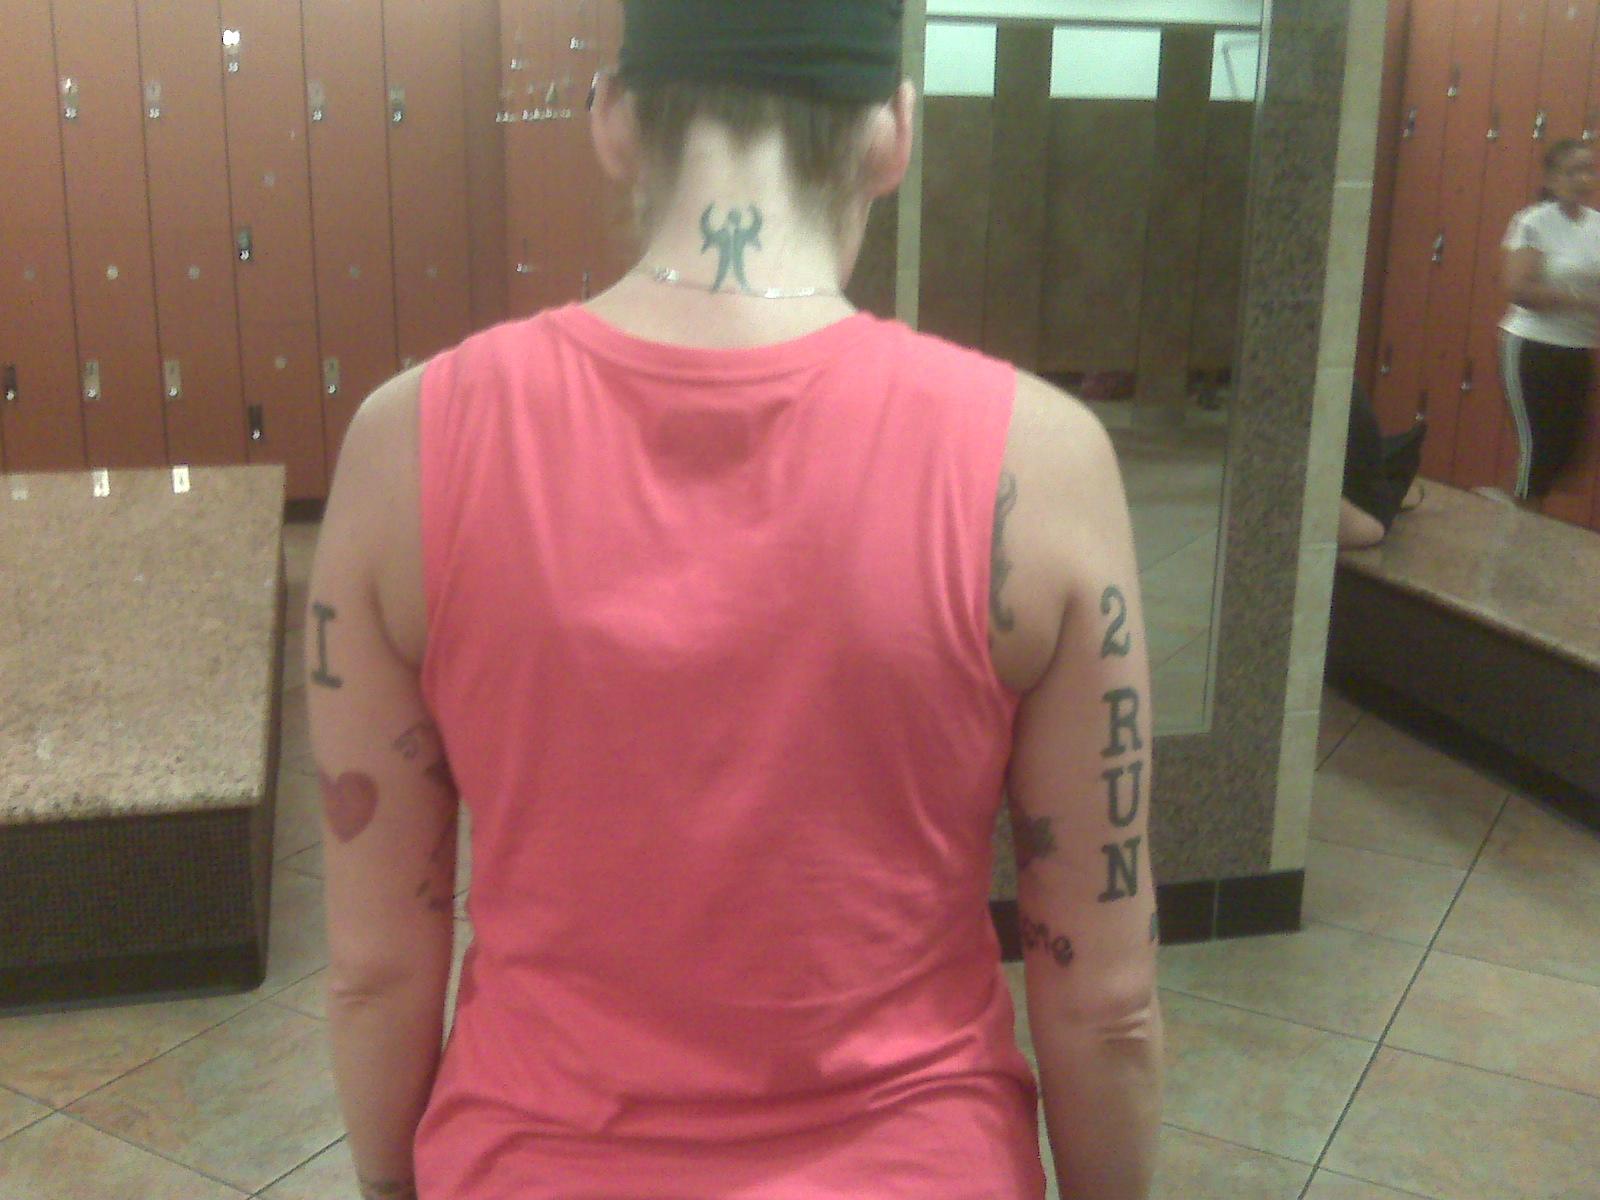 The Ironman Tattoo